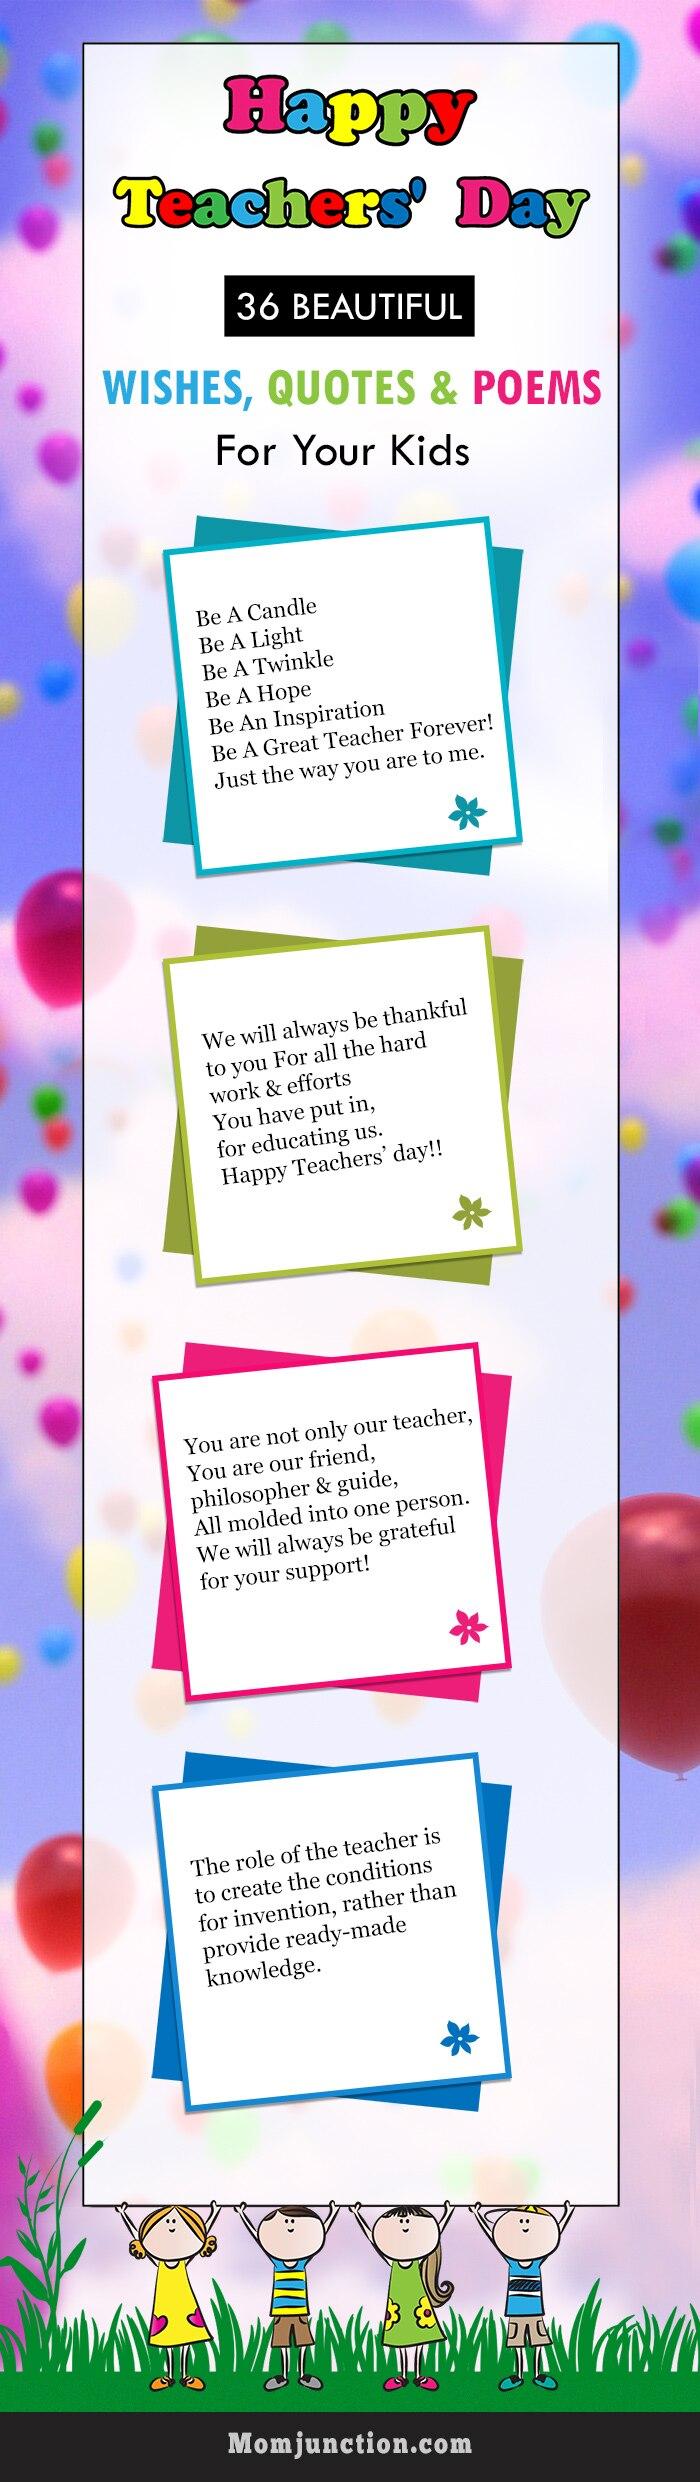 Teachers Day Poems For Kids | www.pixshark.com - Images ...